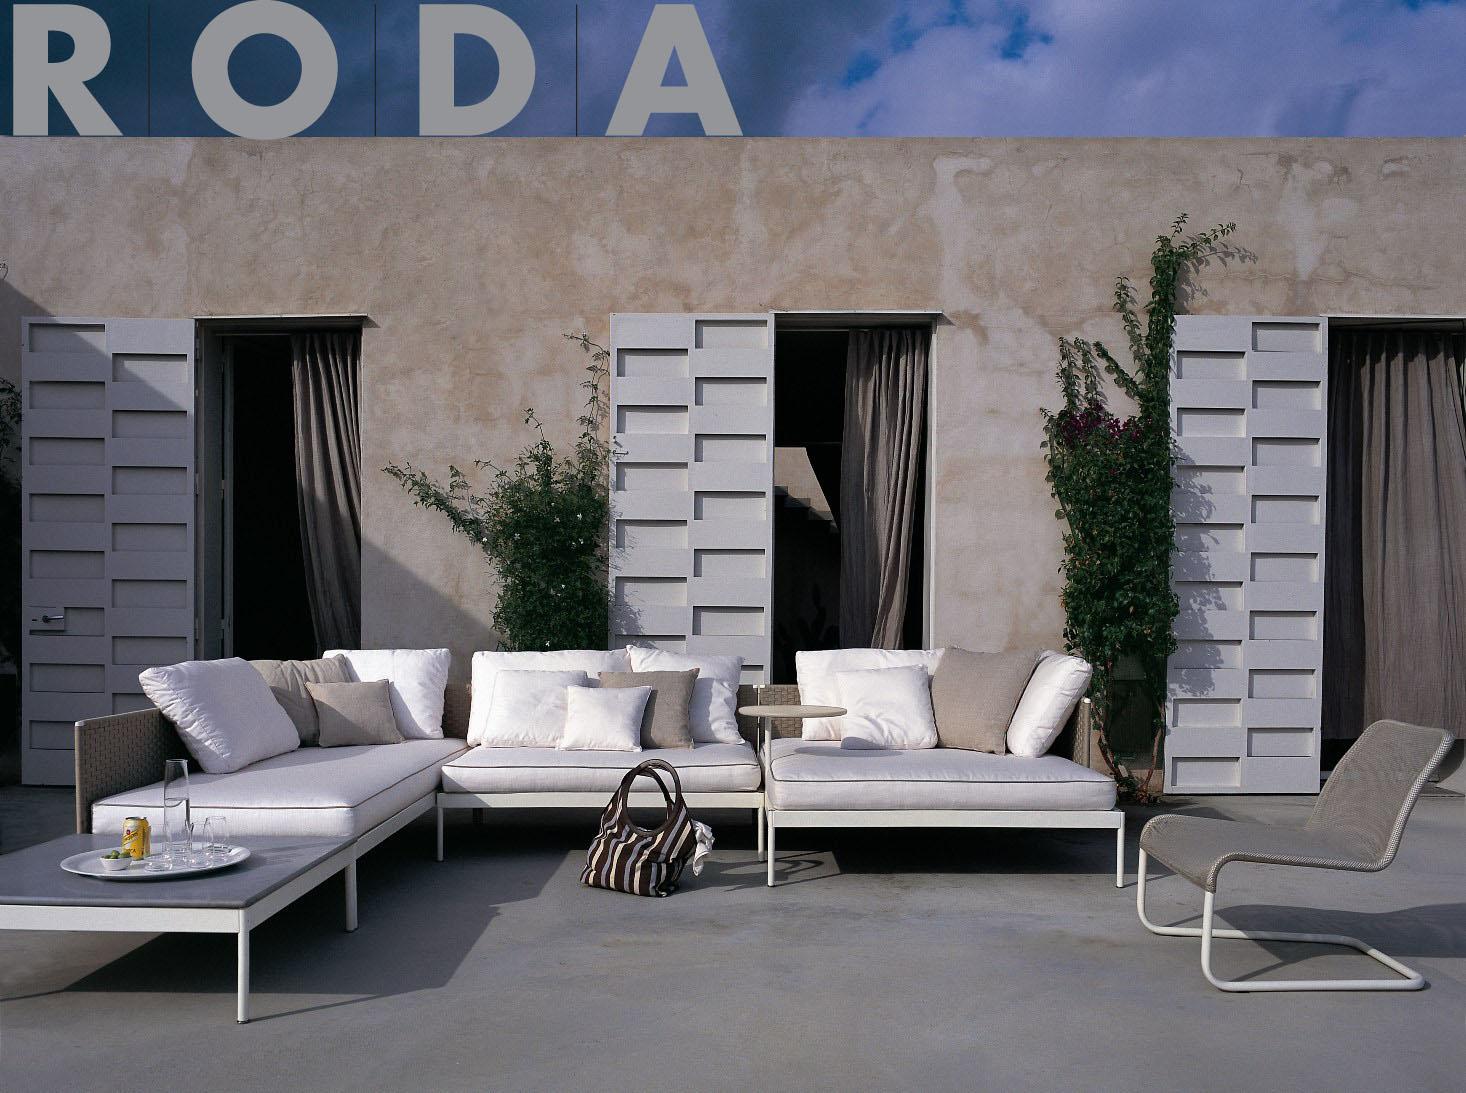 Studio b creates luxury outdoor living spaces far beyond for Luxury outdoor living spaces